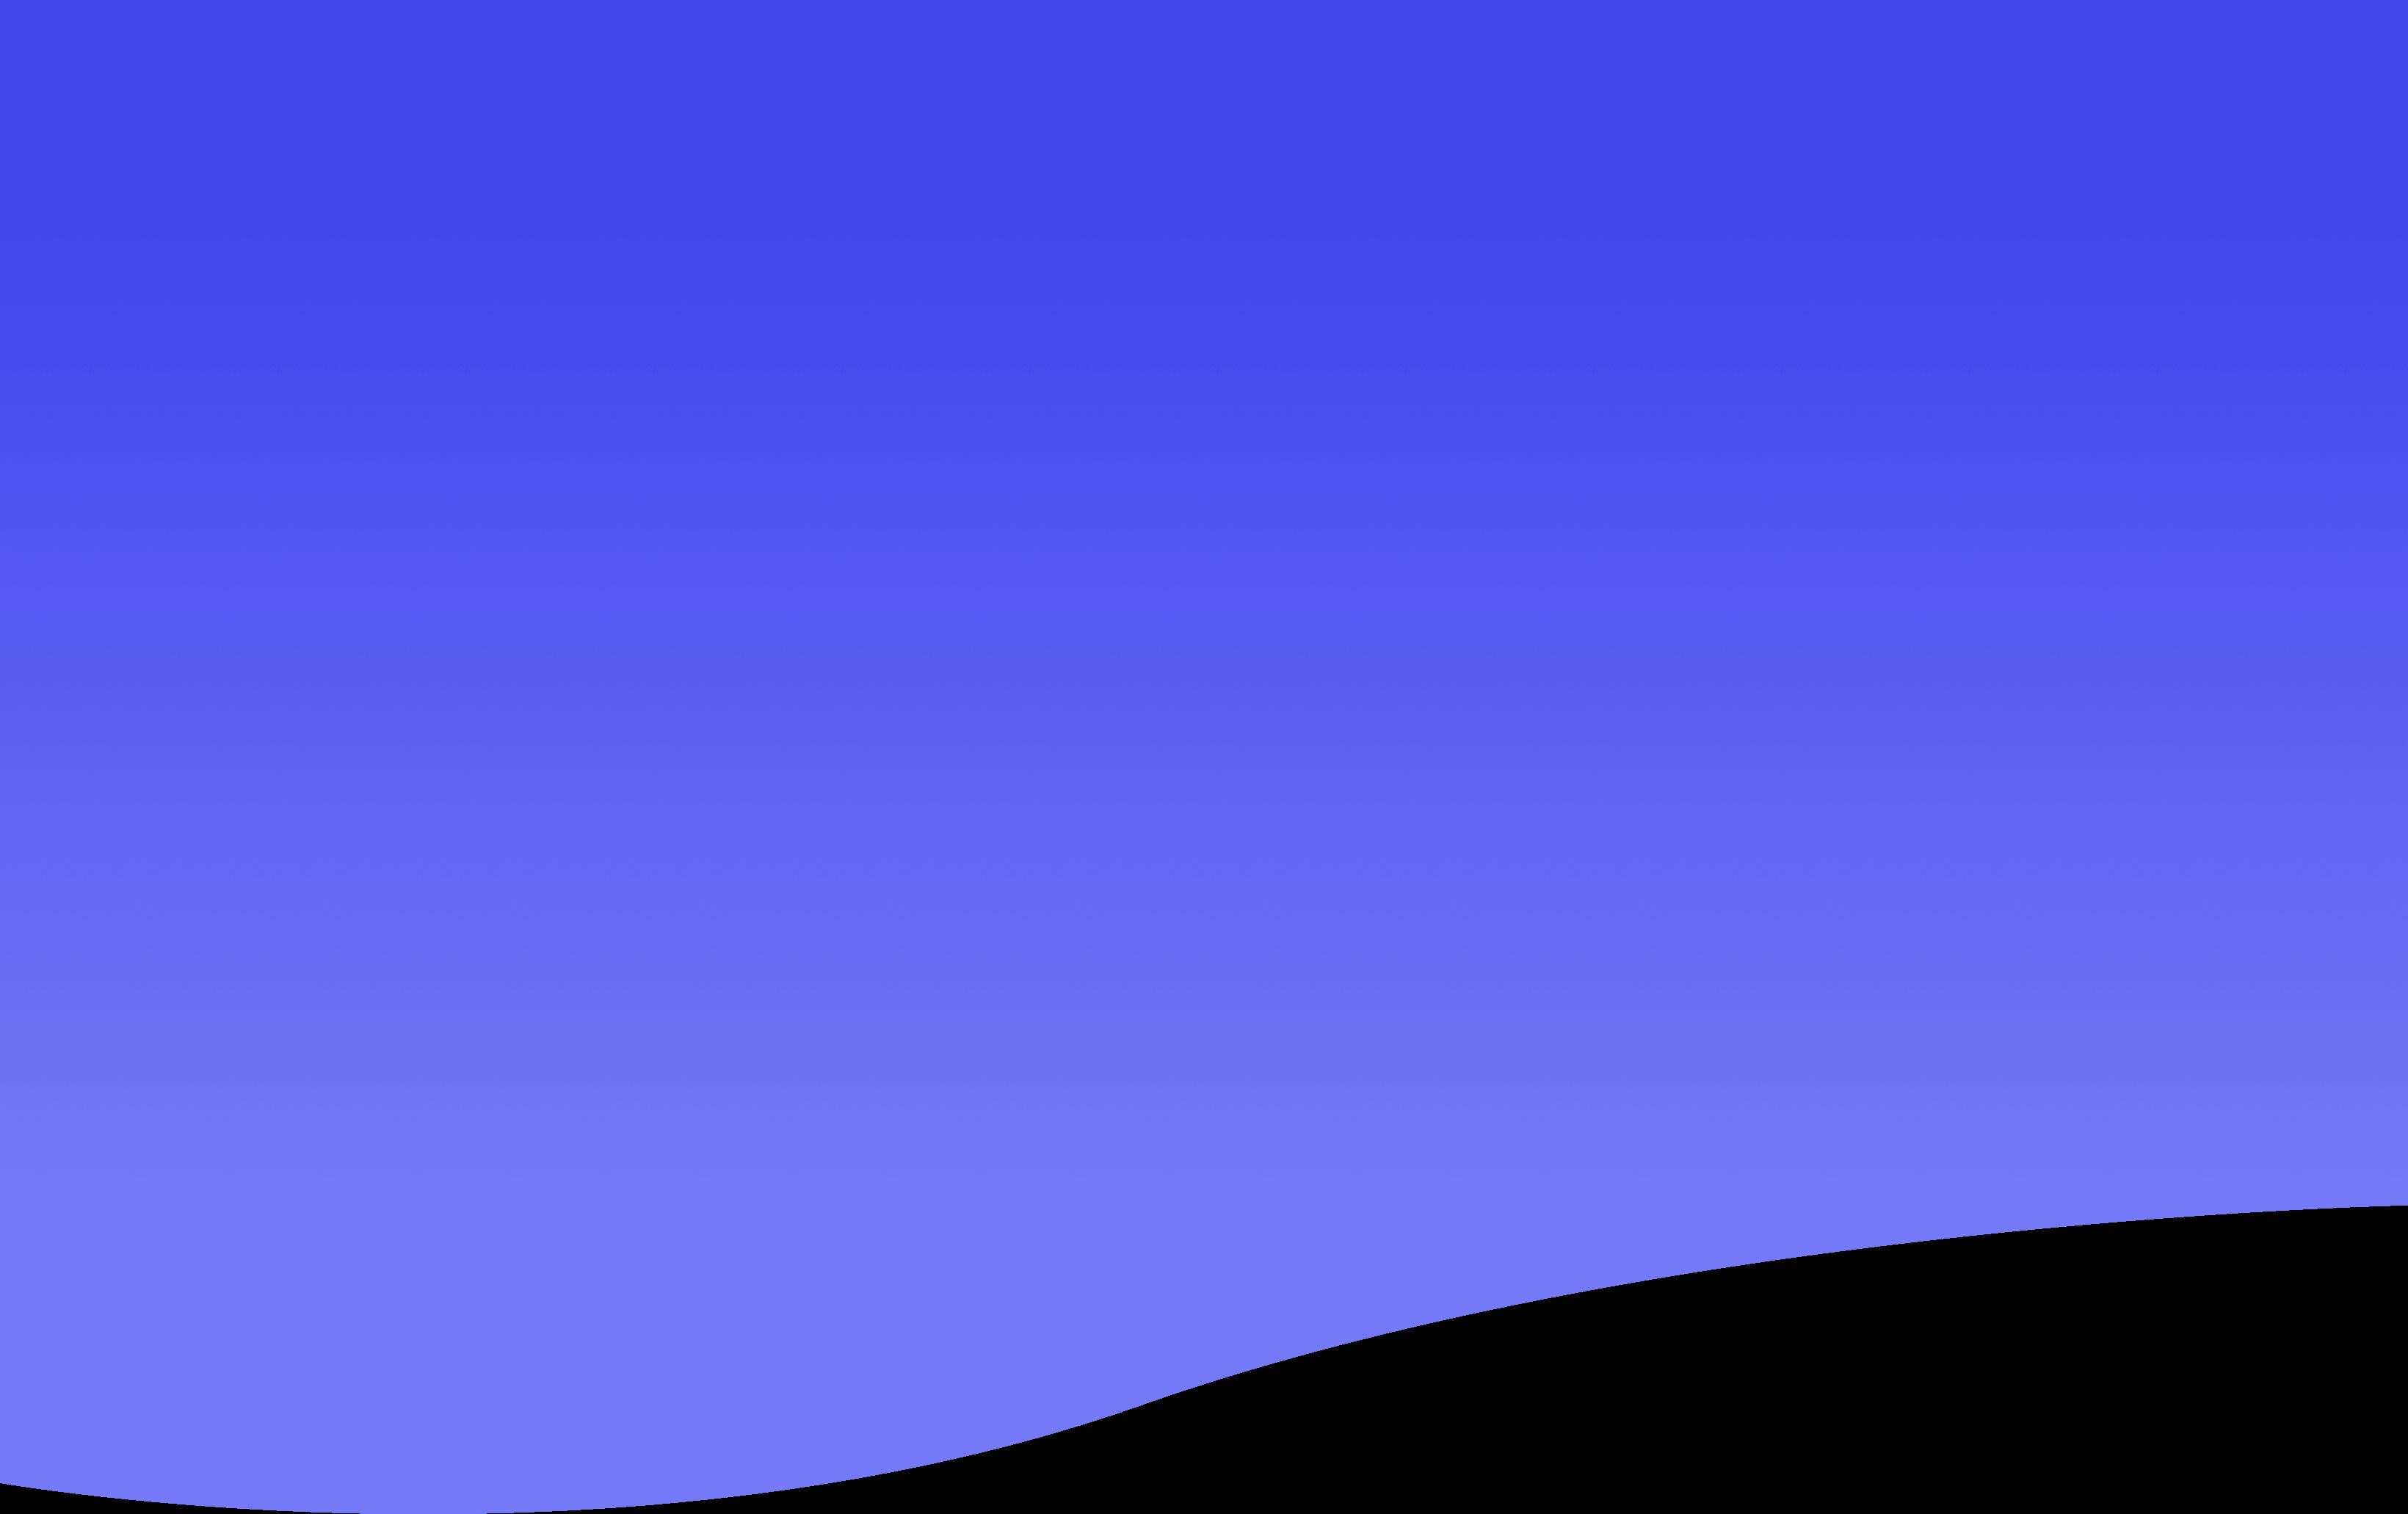 bg-03